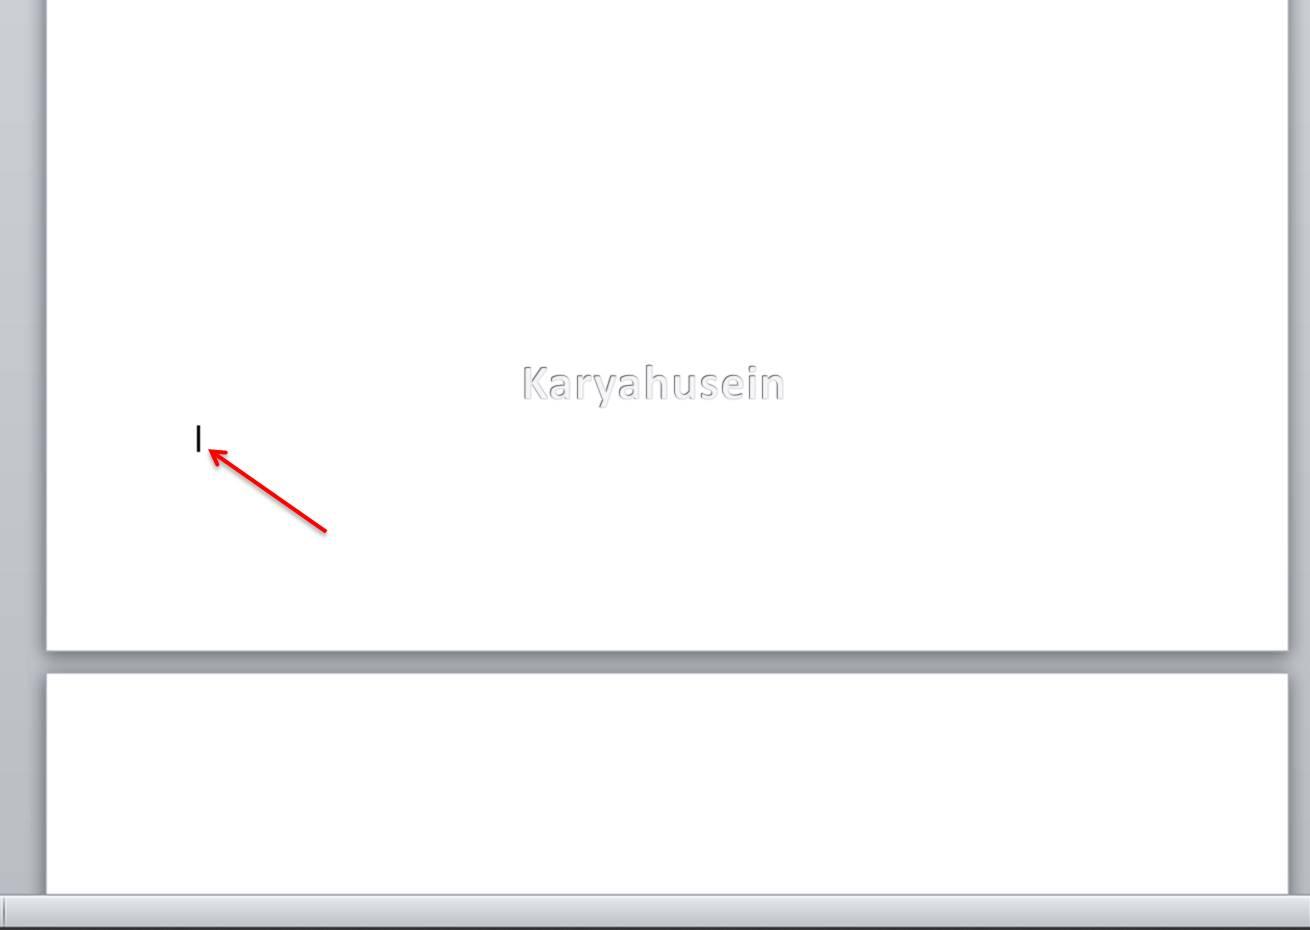 Letakkan kursor mouse di awal halaman untuk menambah halaman